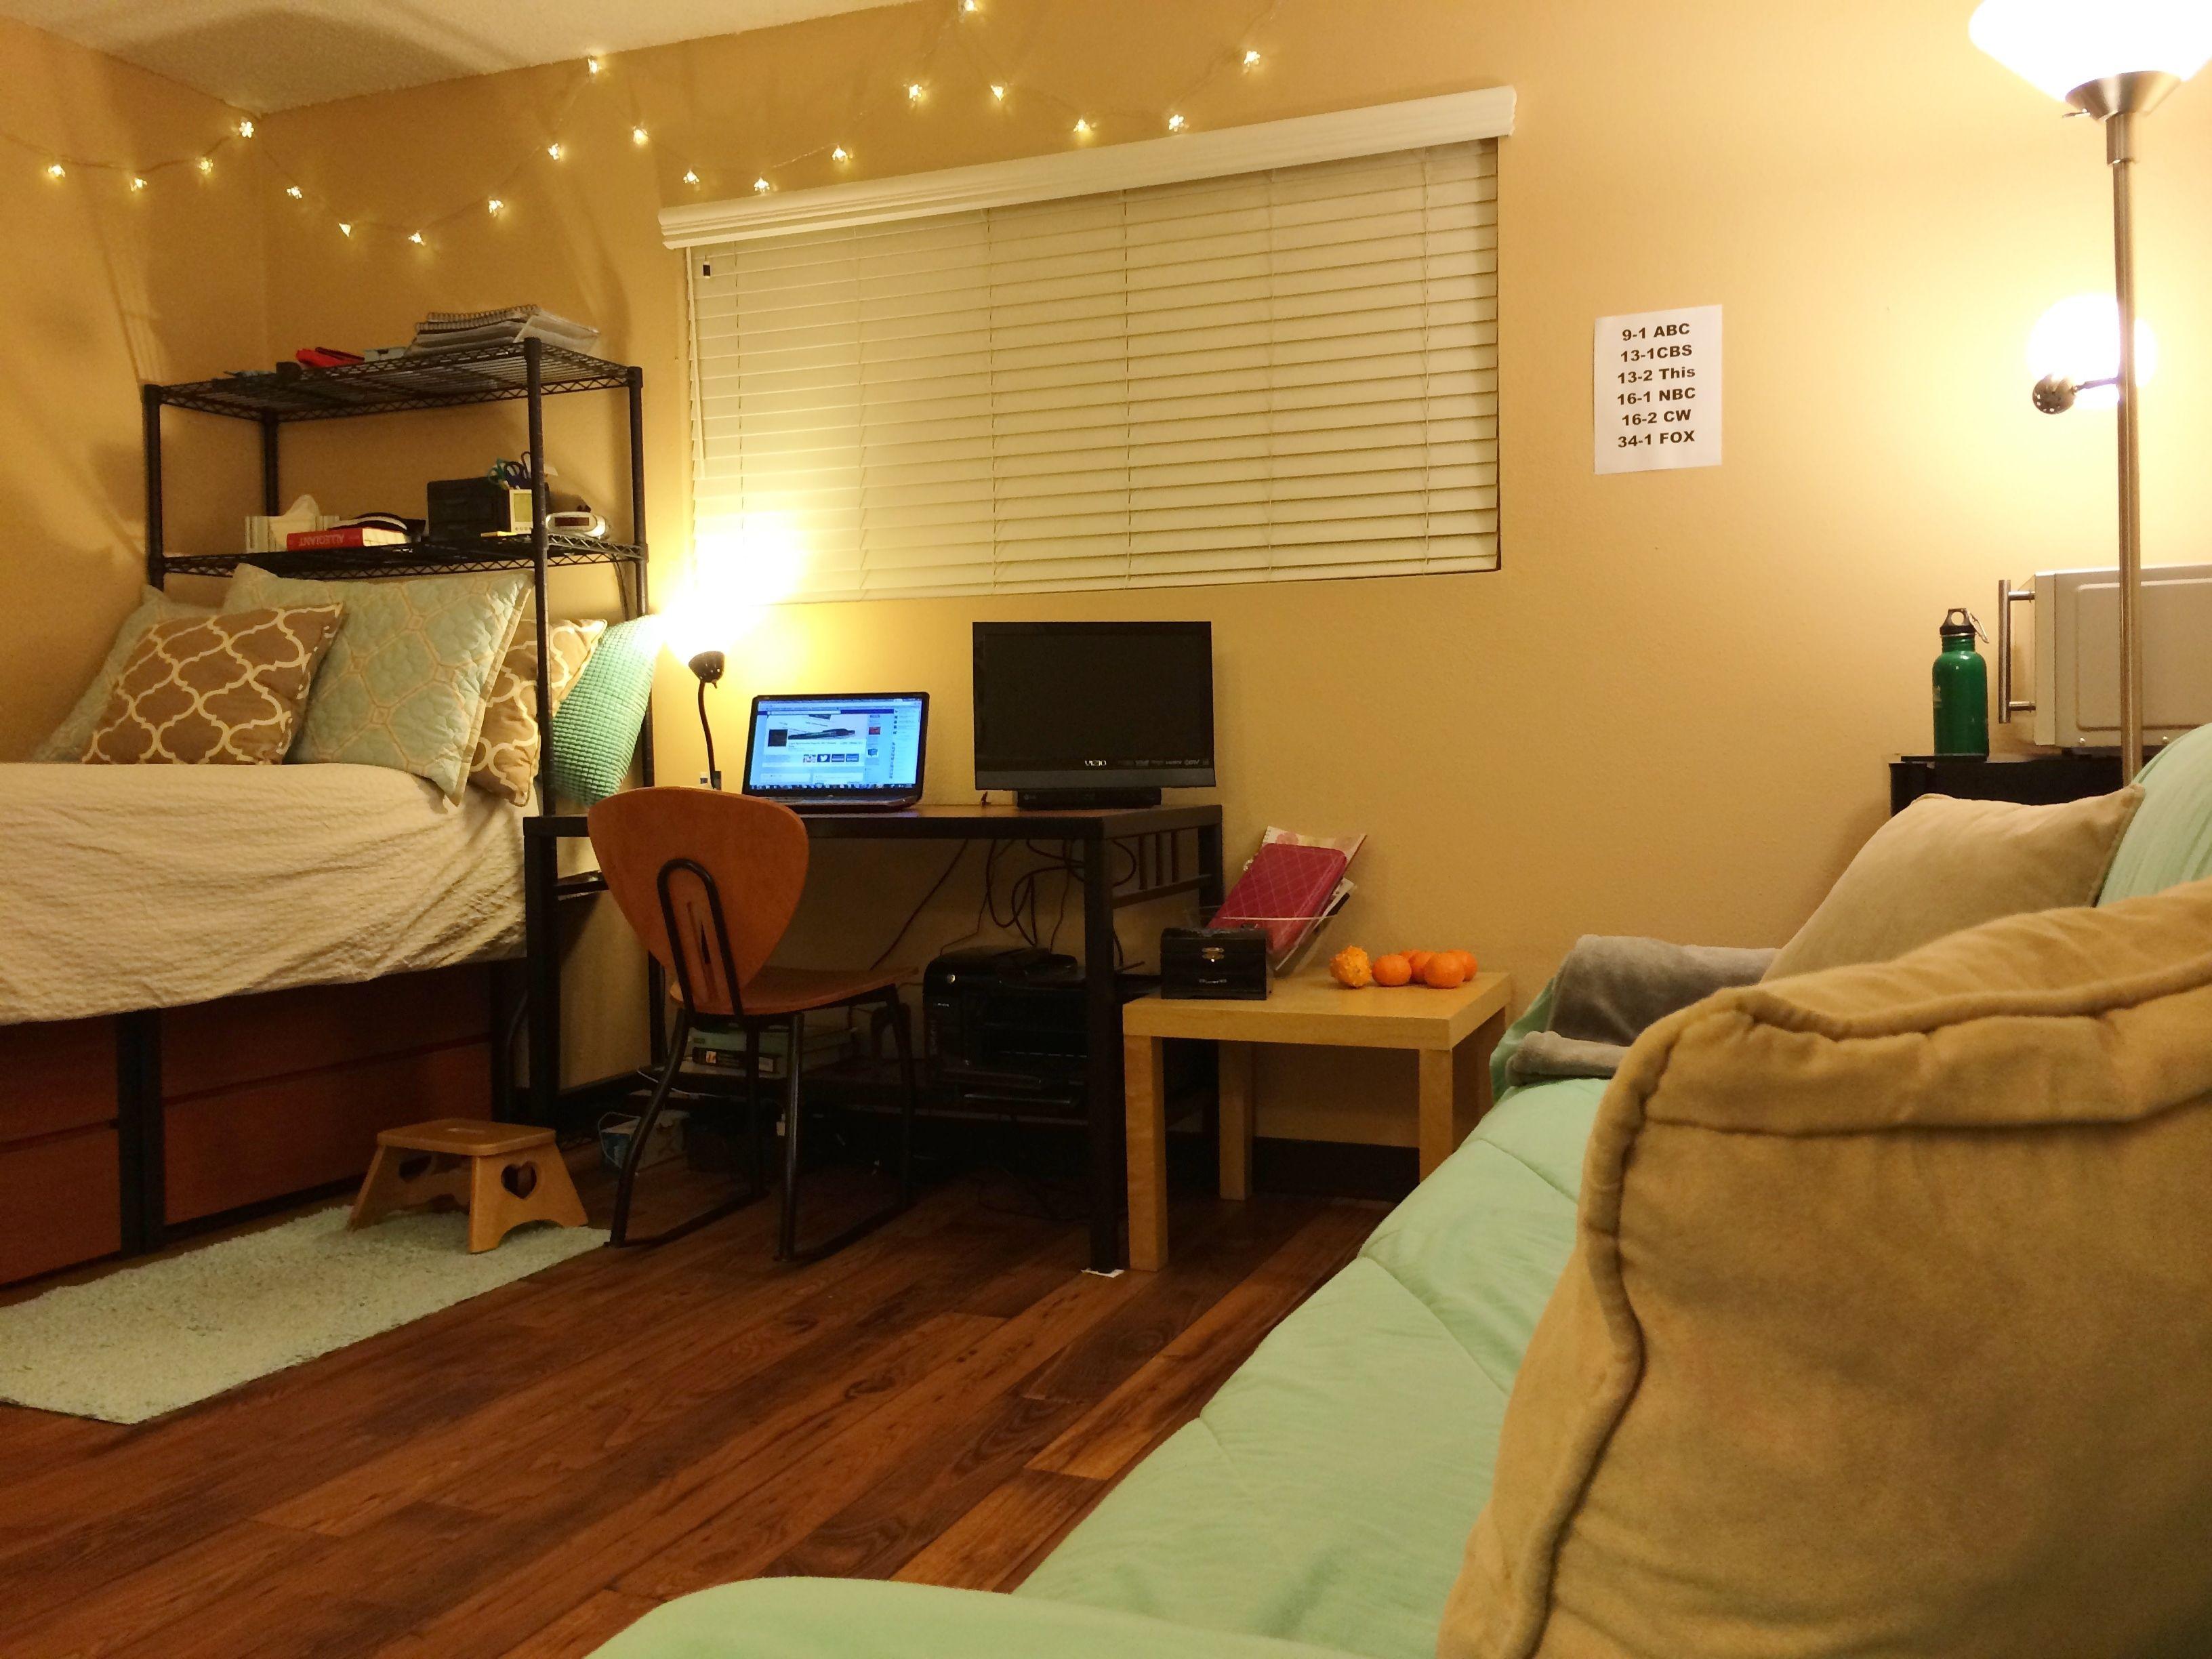 College Apartment Bedroom Ideas | College Apartment Décor ...